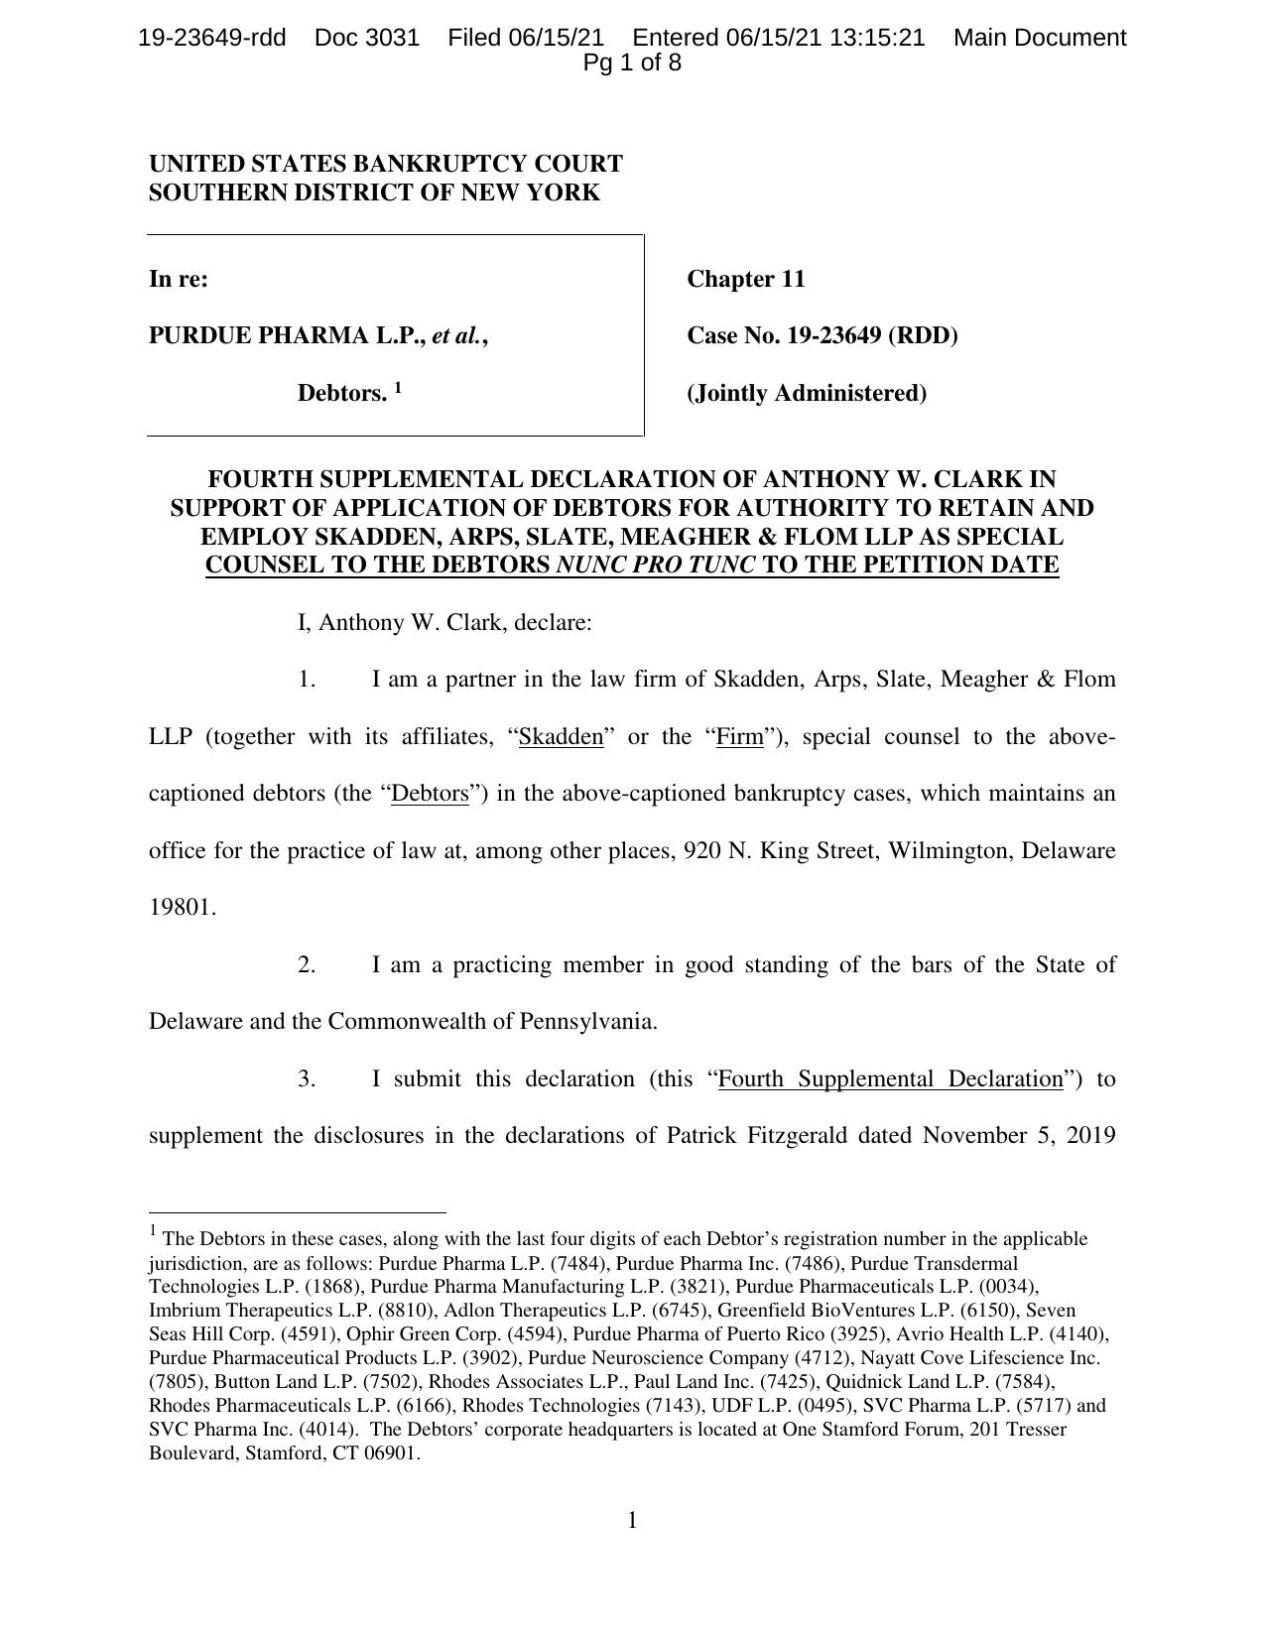 Purdue Pharma bankruptcy document